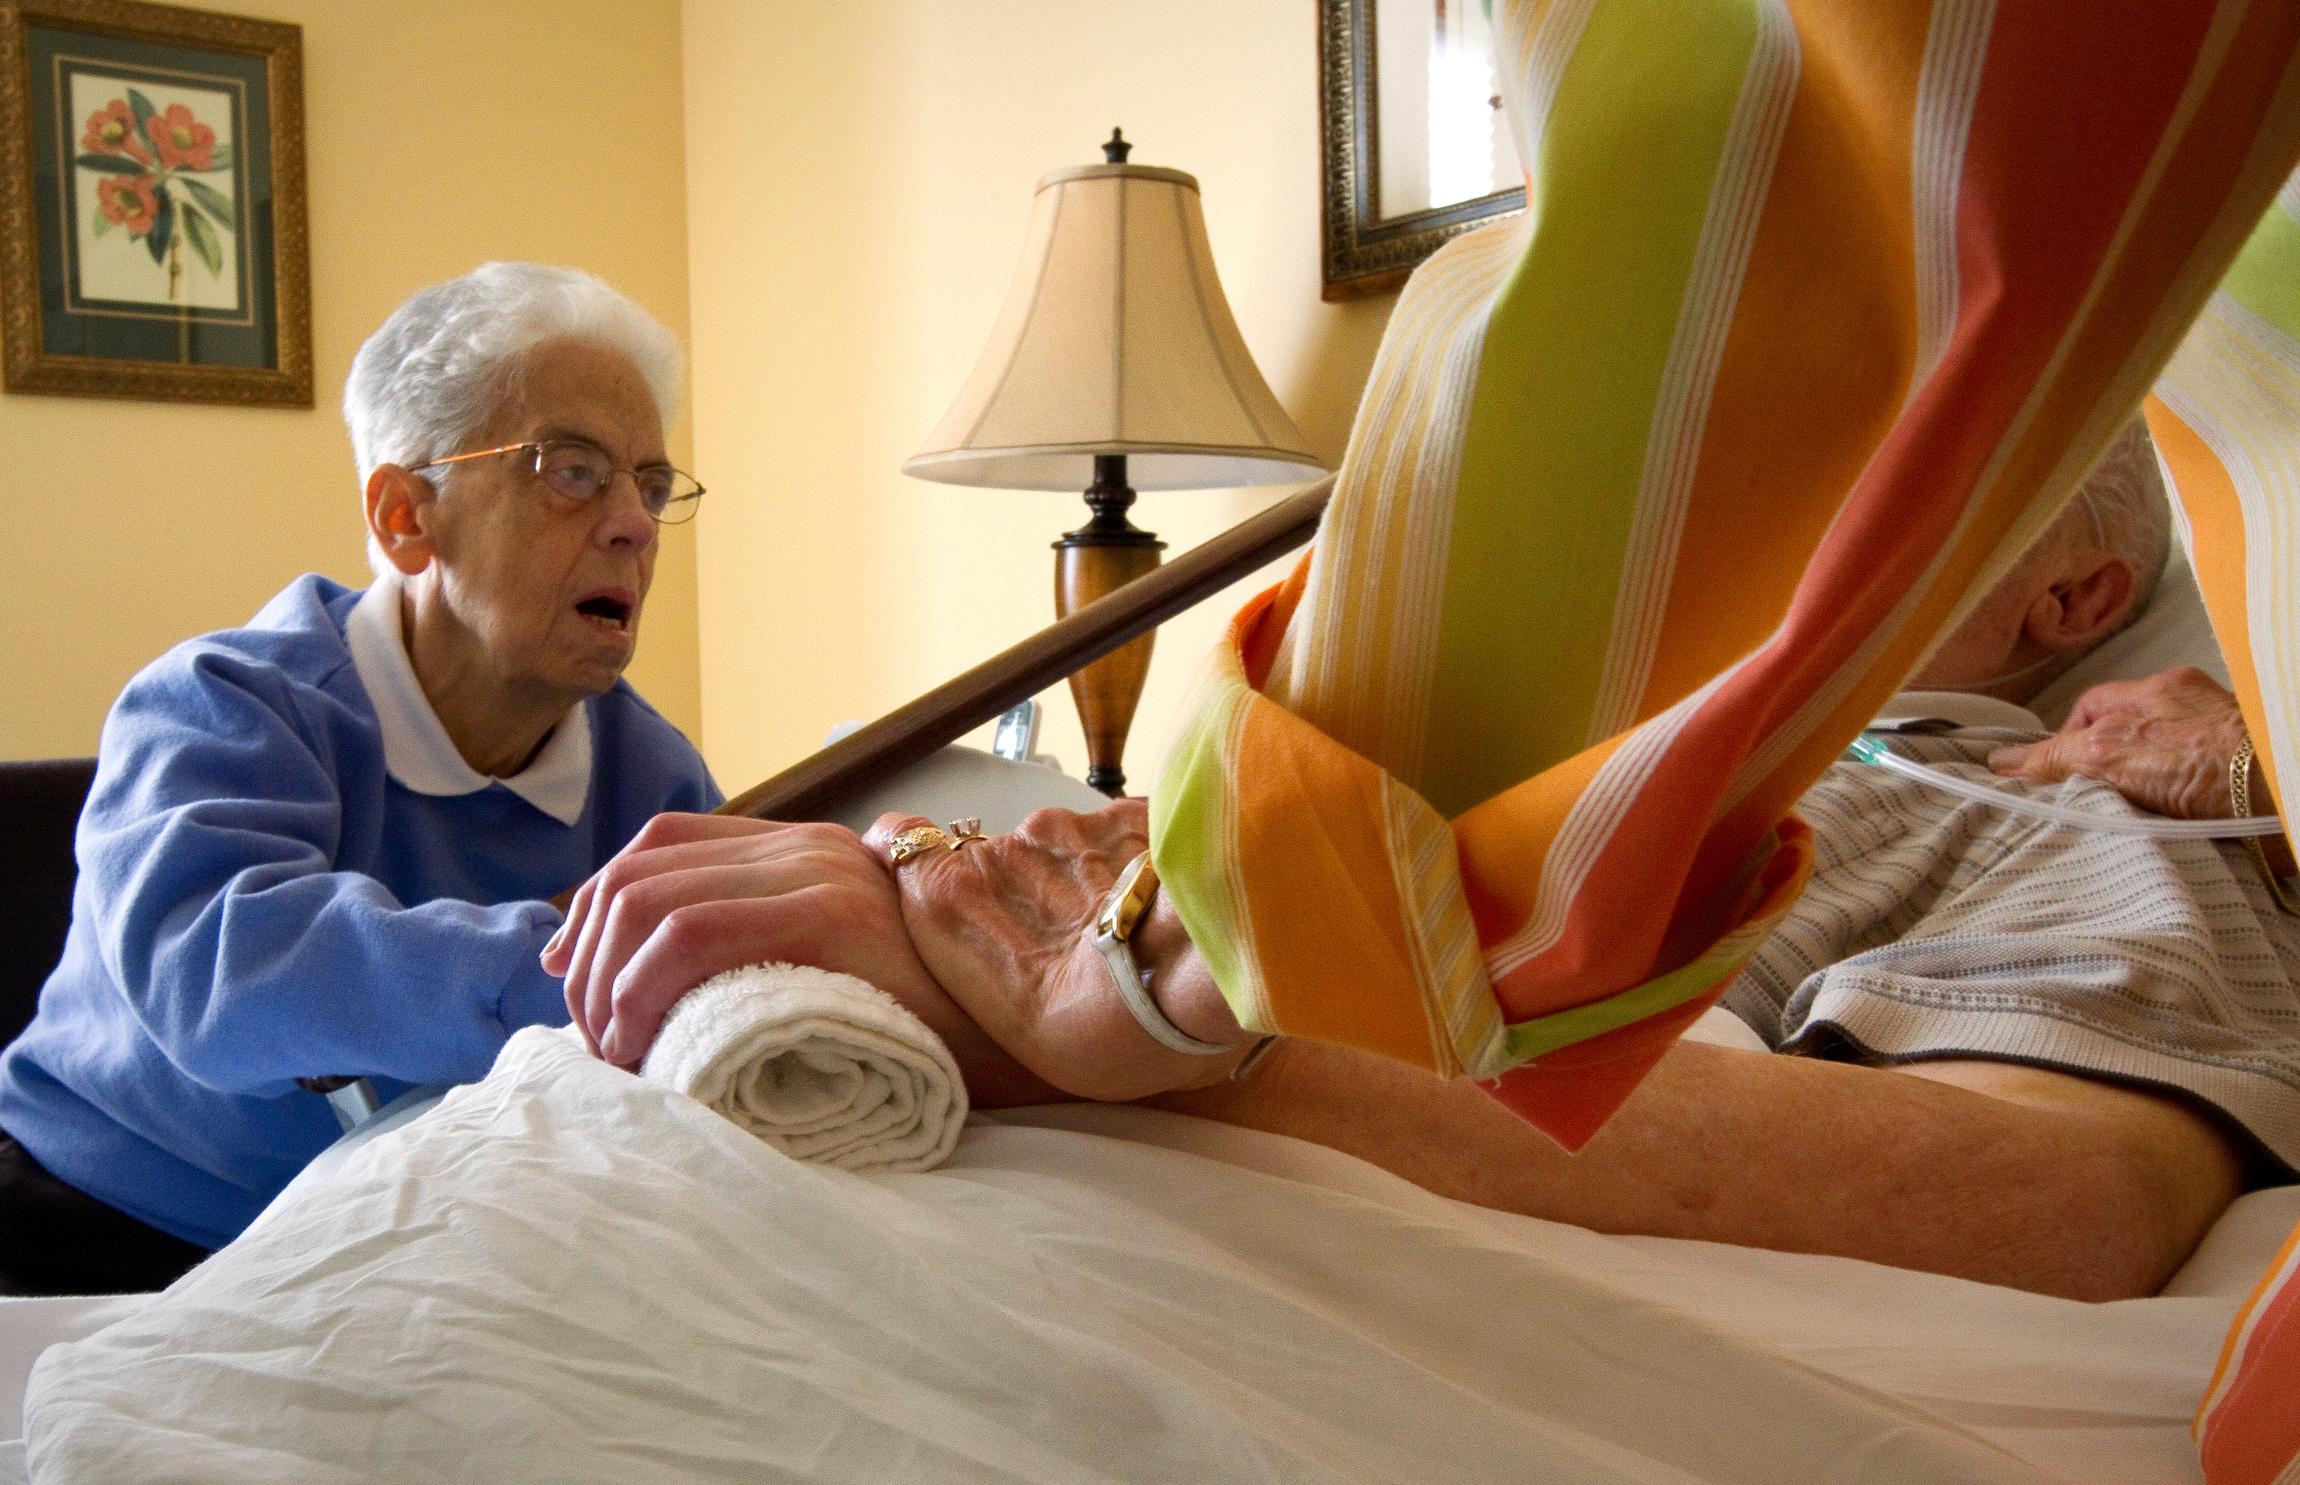 The scourge of modern times - knee arthritis 51